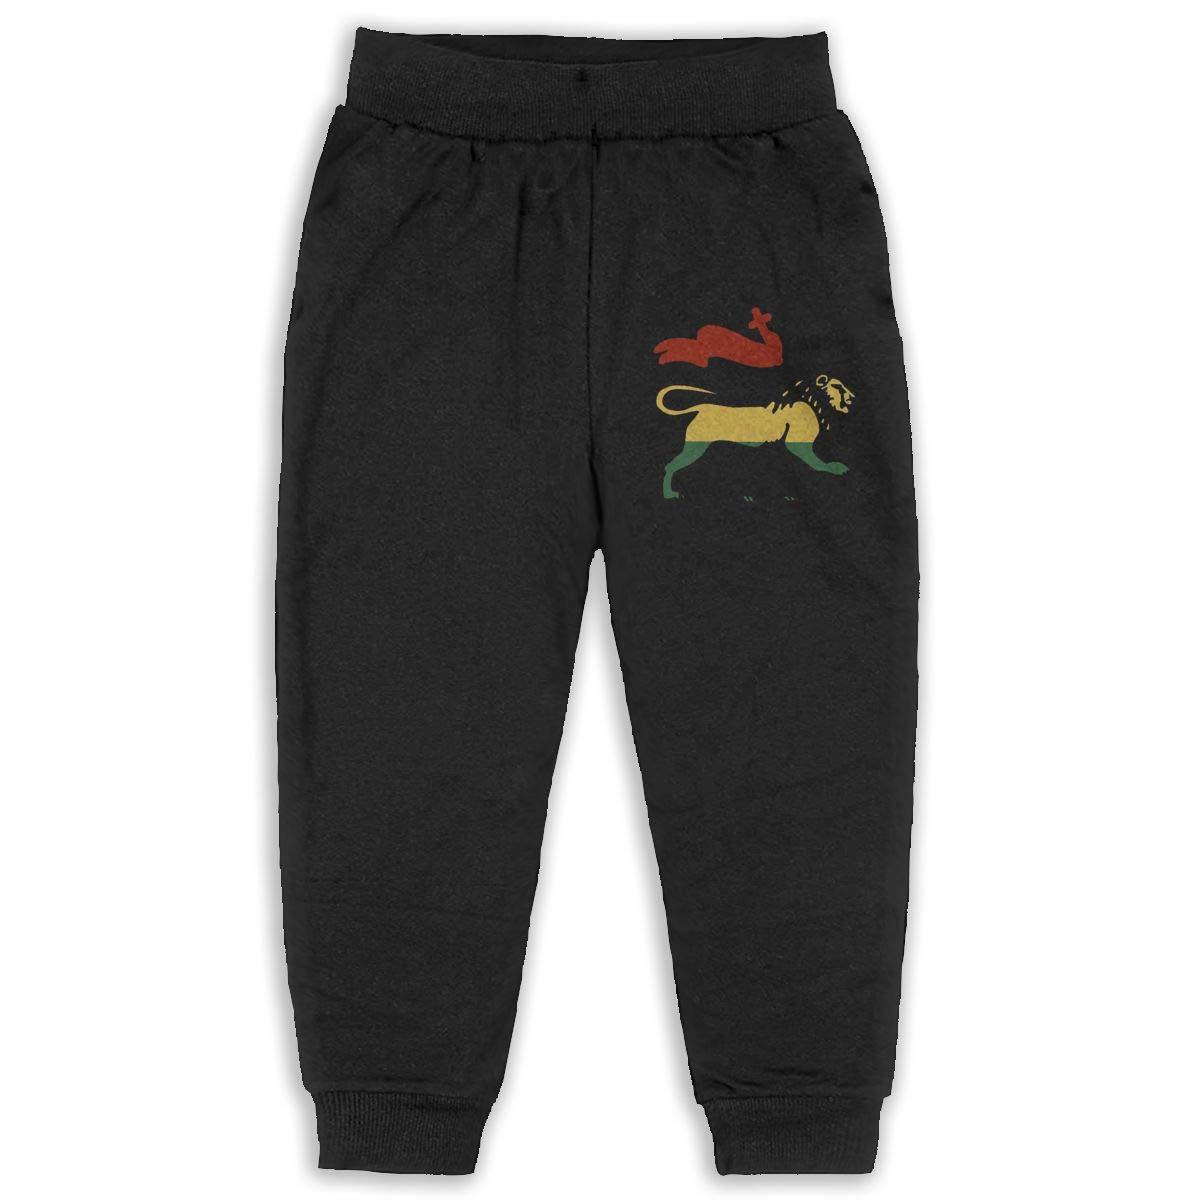 Reggae Rasta Lion Kids Cotton Sweatpants,Jogger Long Jersey Sweatpants